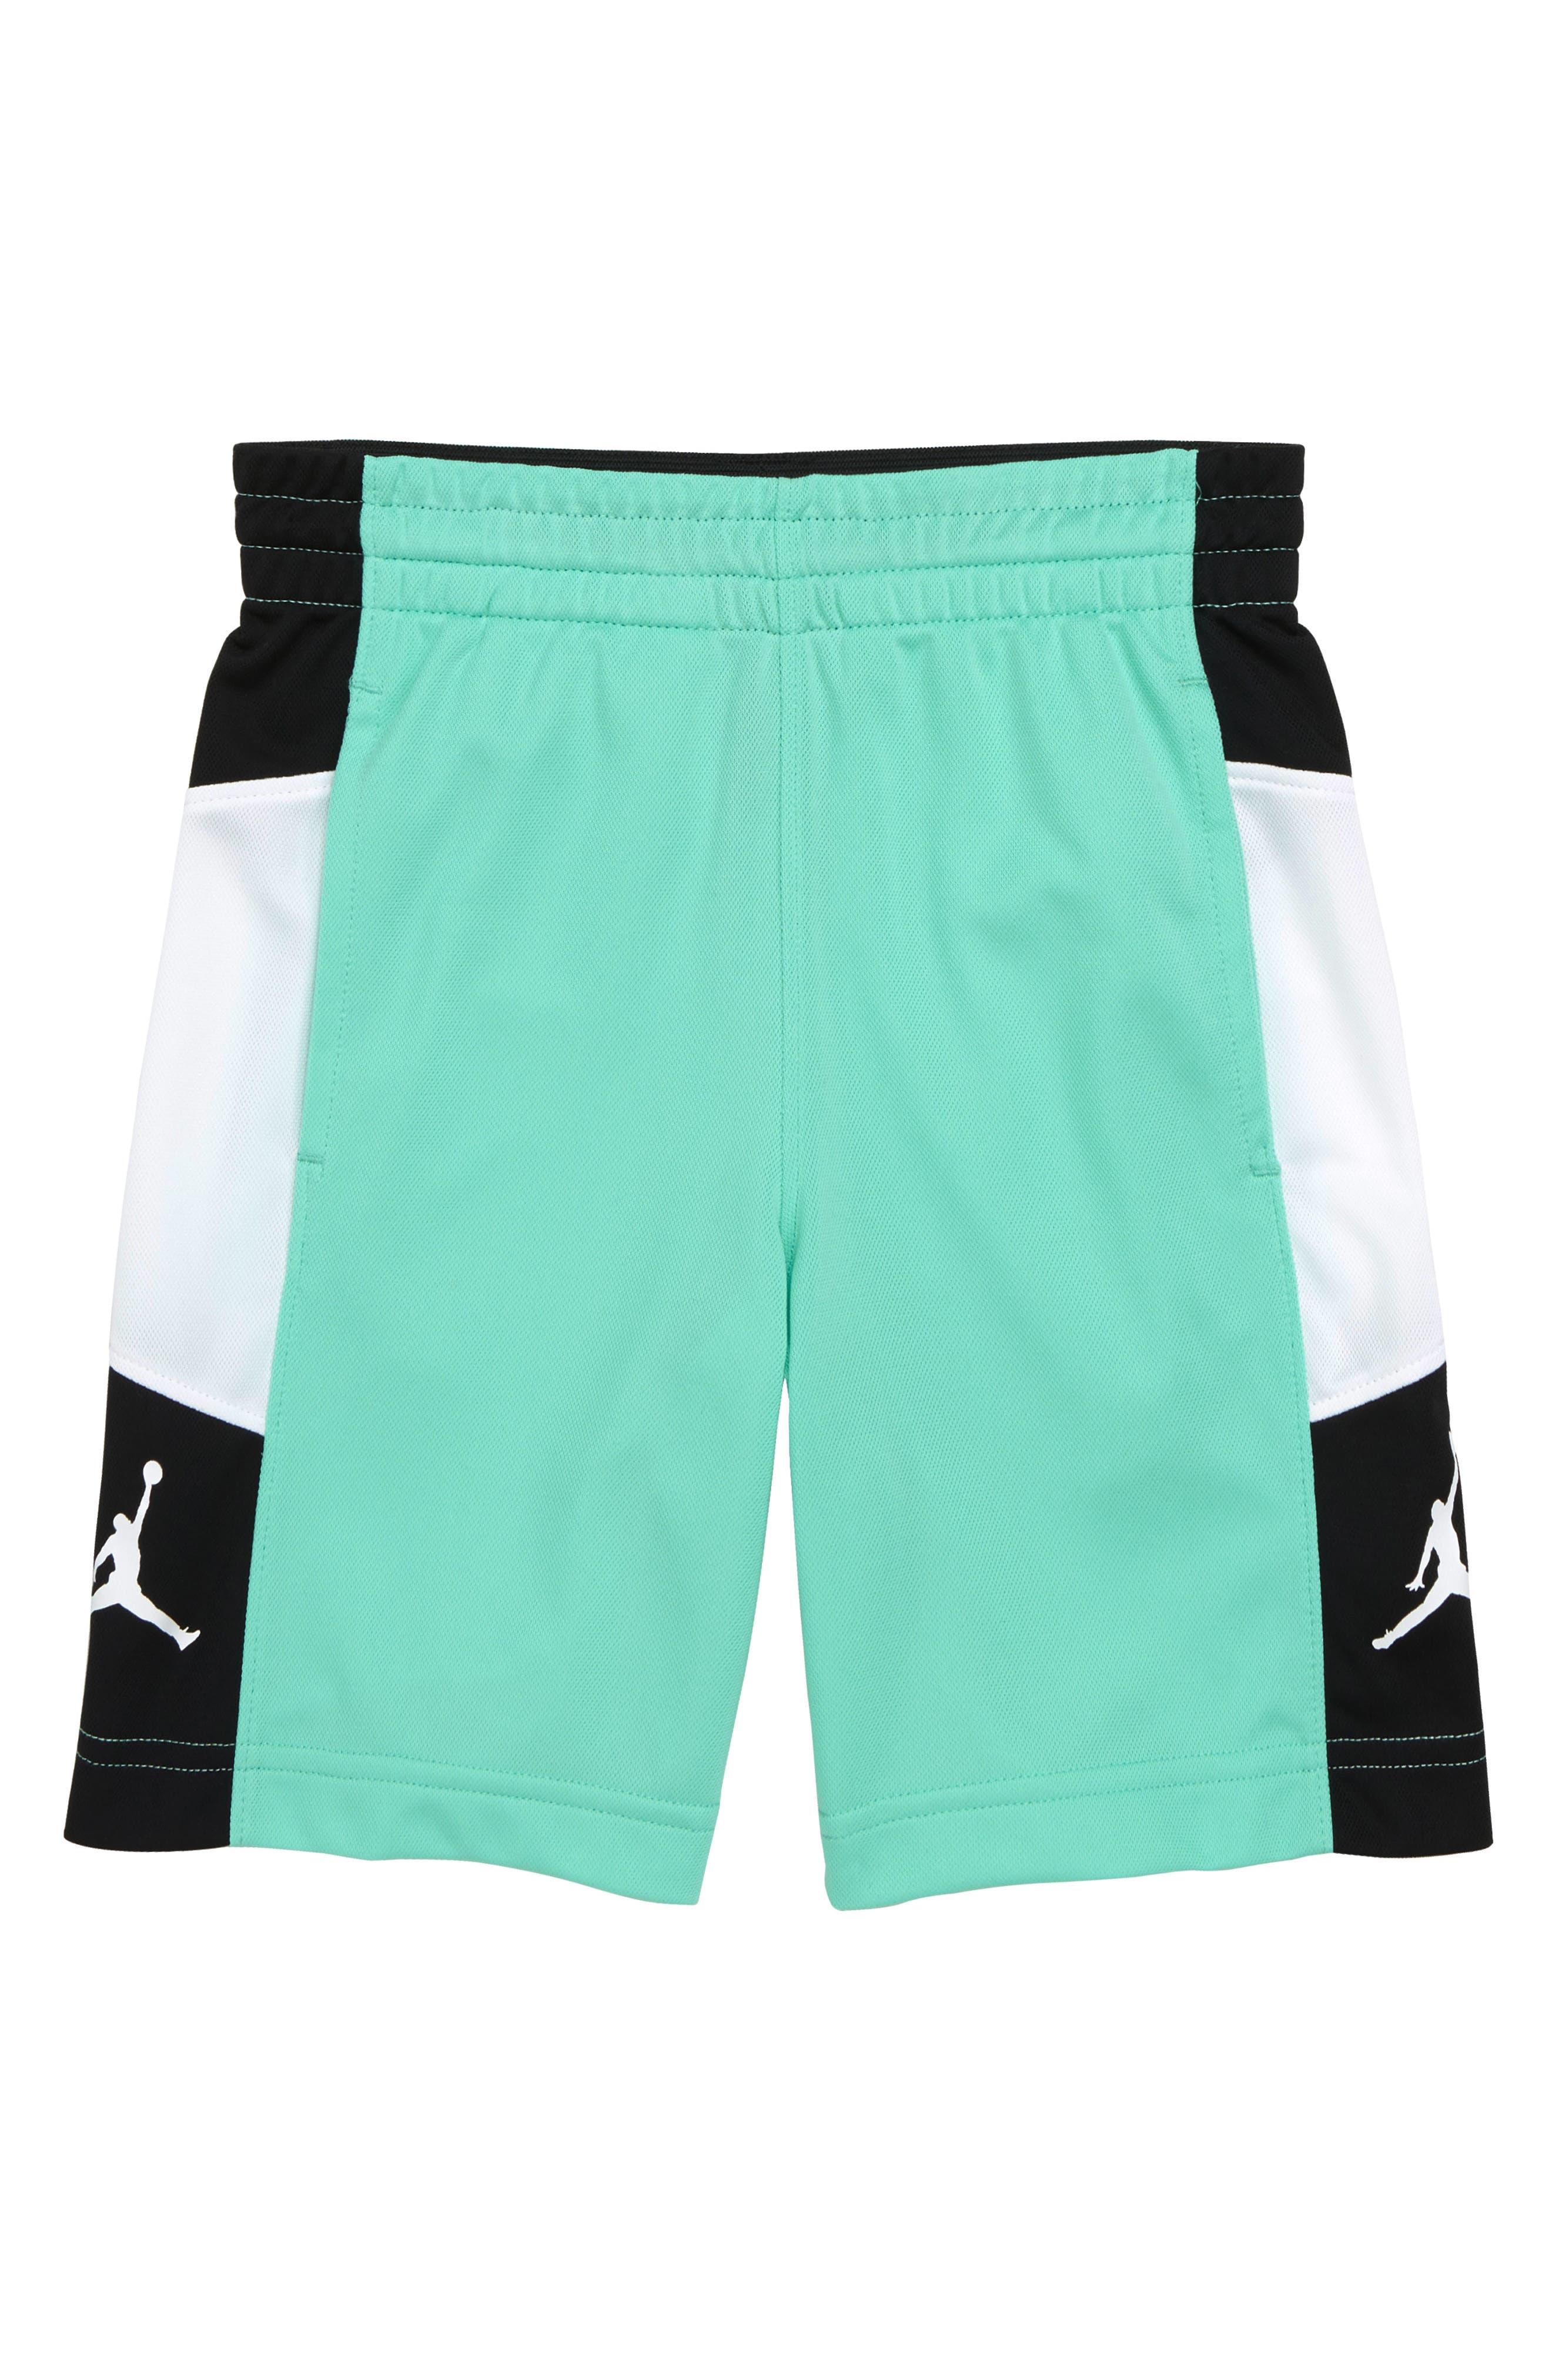 Jordan Rise Elevate Shorts,                         Main,                         color, Emerald Rise